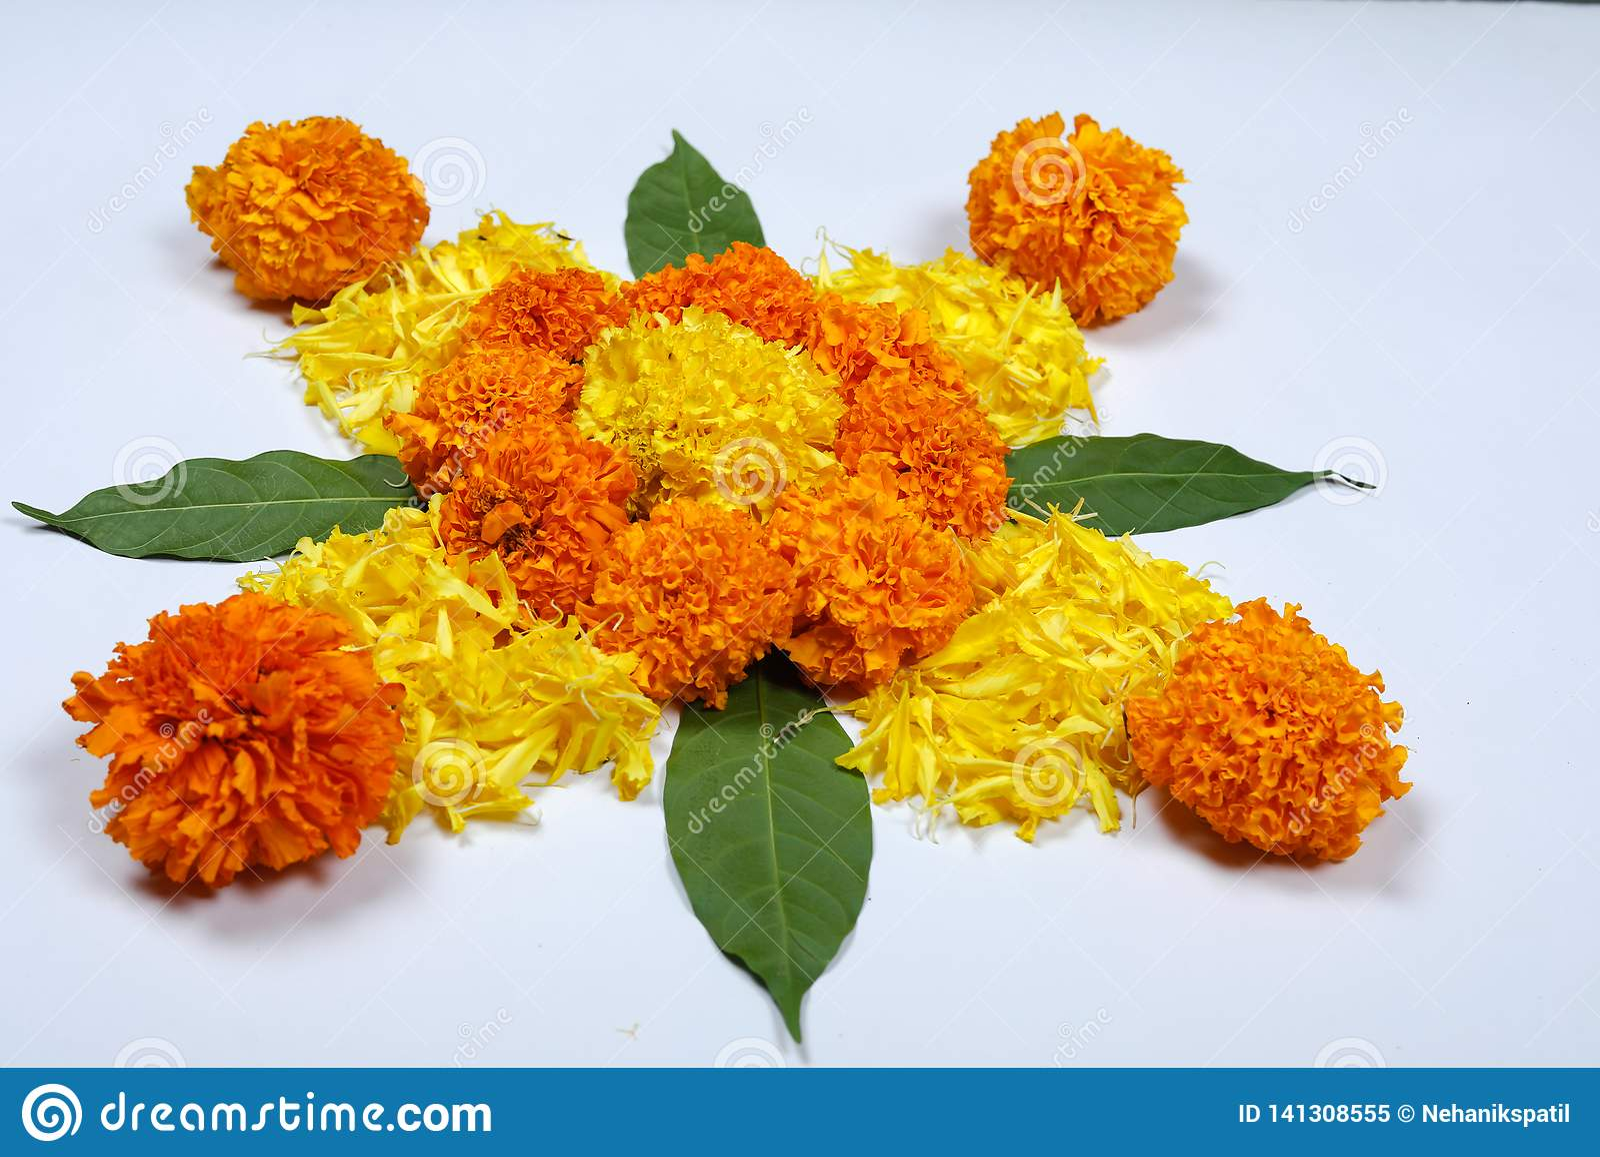 Nagietka kwiatu rangoli projekt dla Diwali festiwalu, Indiańska festiwalu kwiatu dekoracja